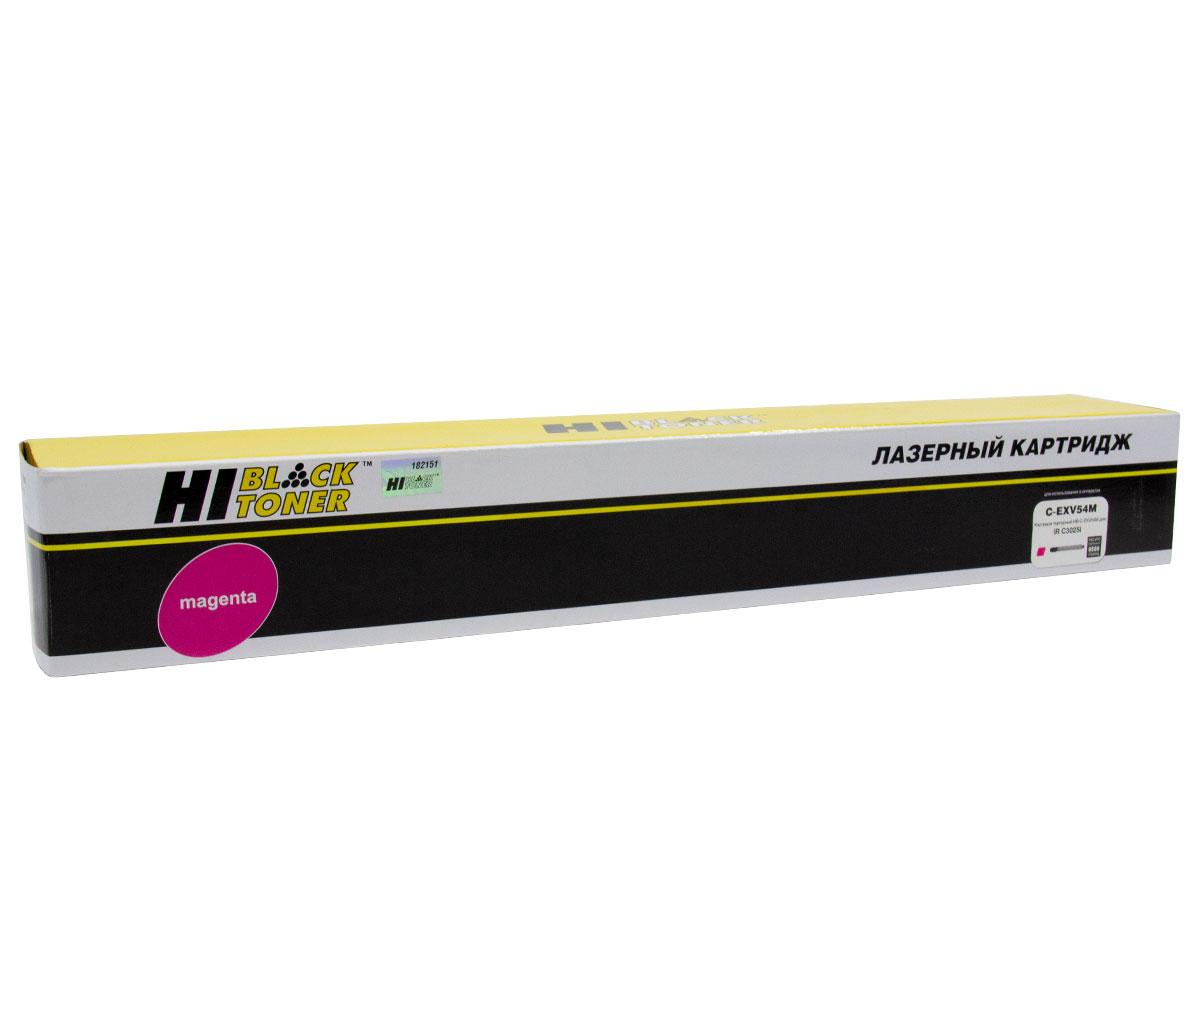 Тонер-картридж Hi-Black (HB-C-EXV54 M) для Canon iR C3025/C3025i/C3125i, M, 8,5K